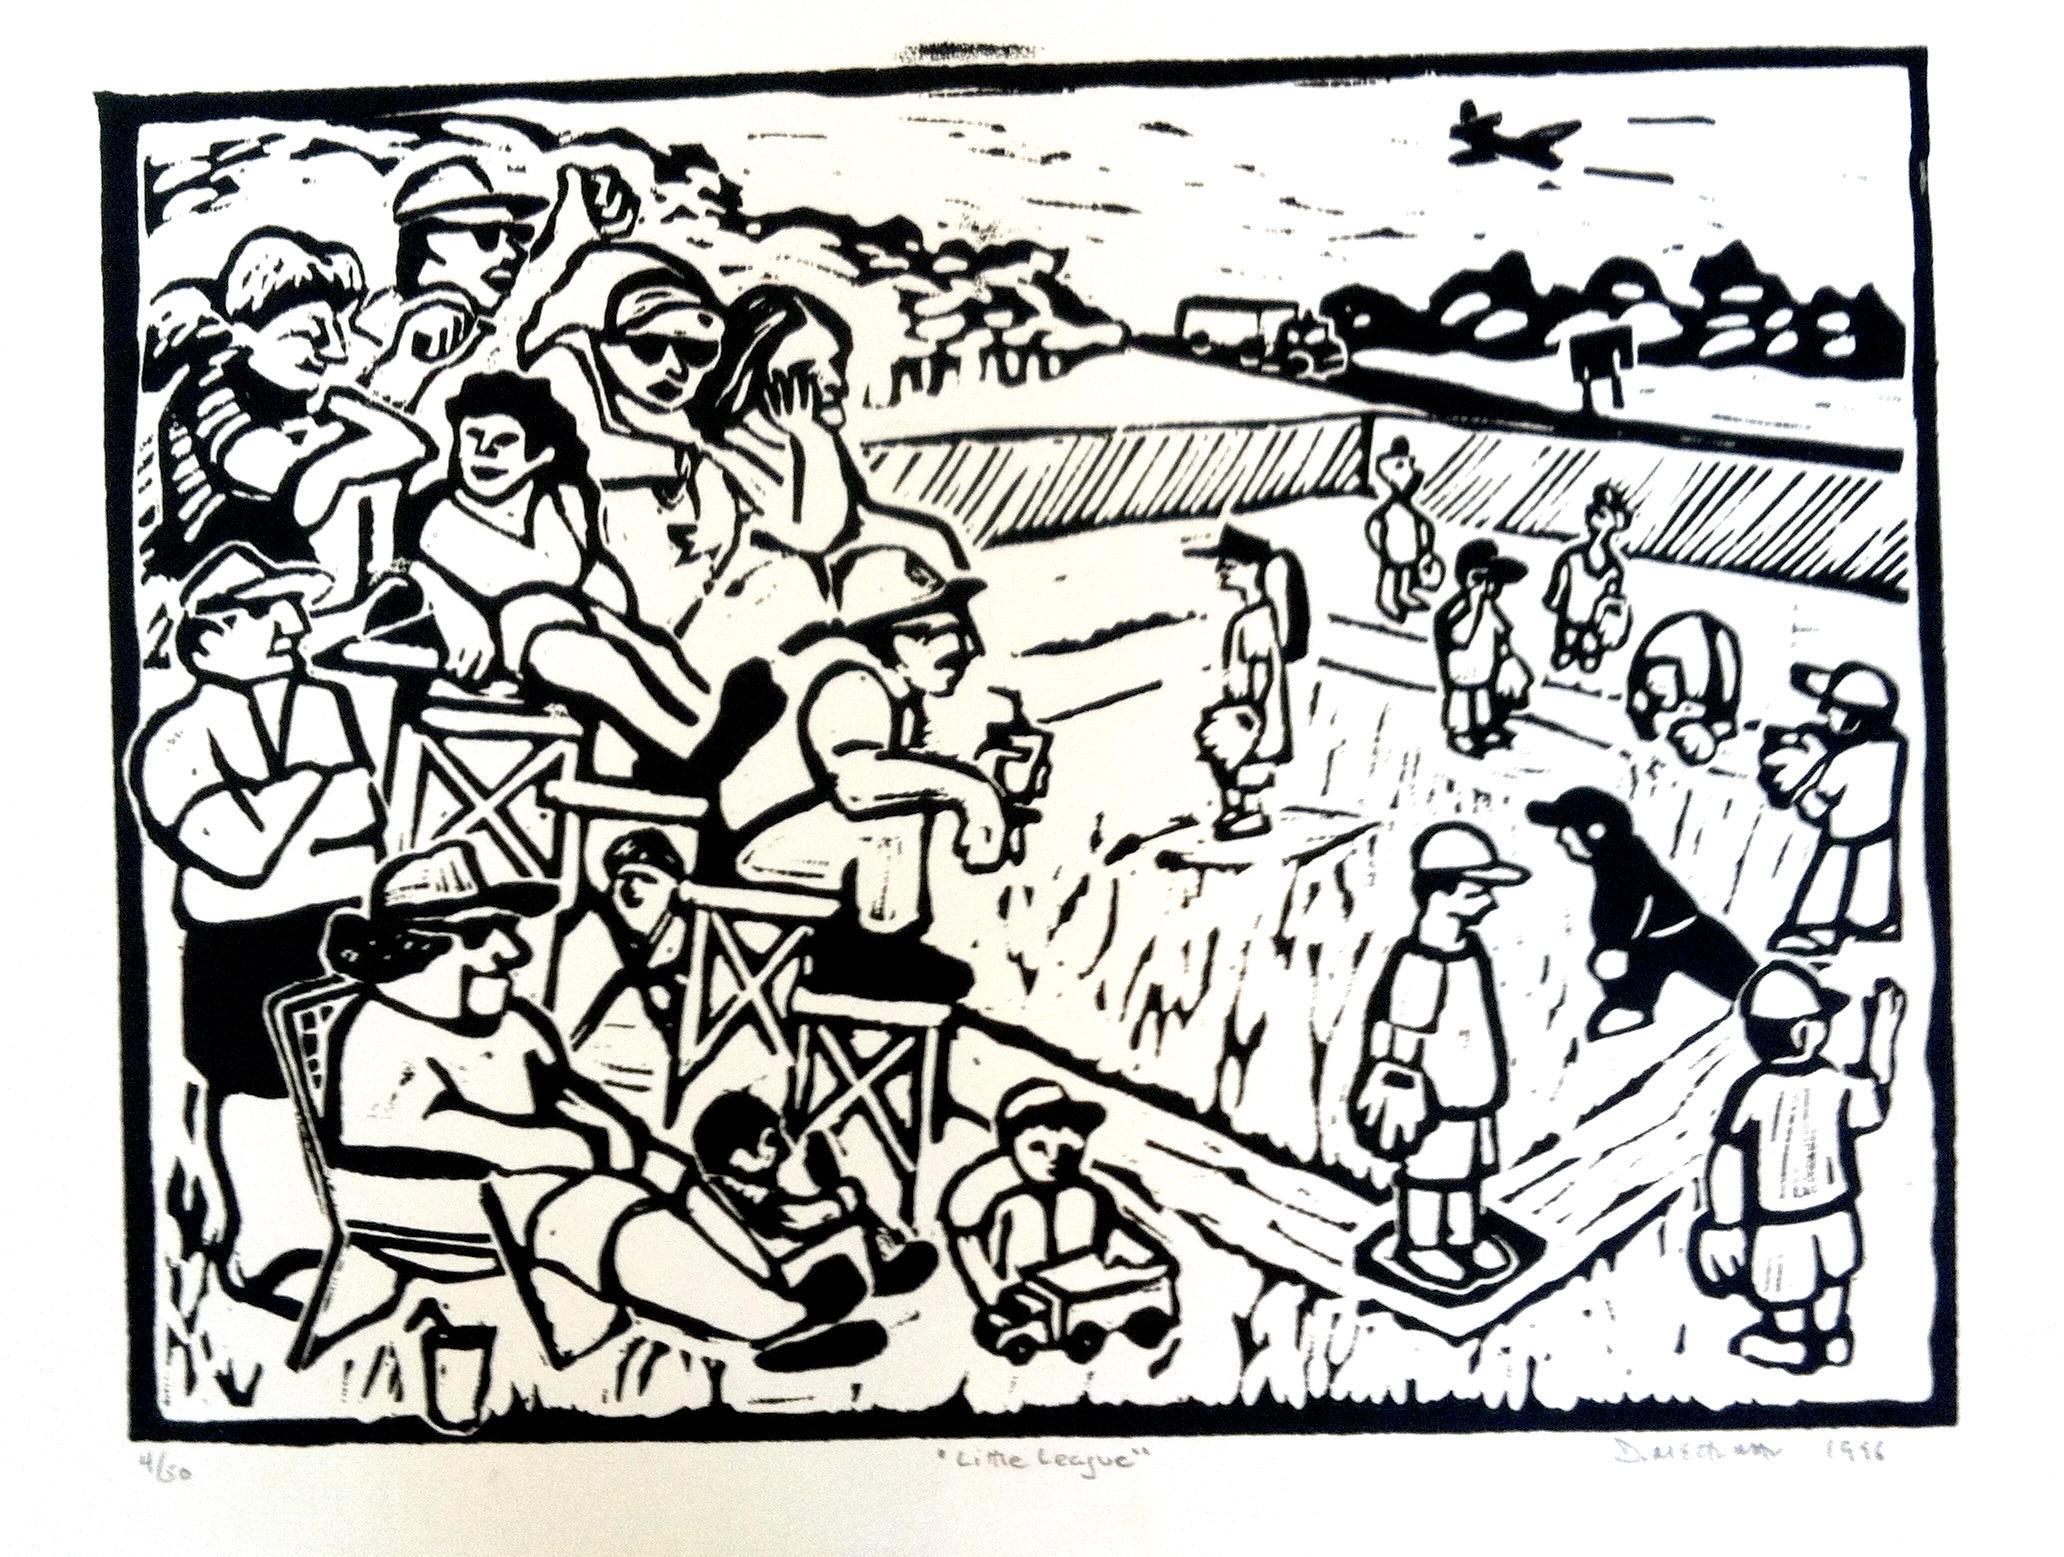 Linocut Print on Paper -- Little League